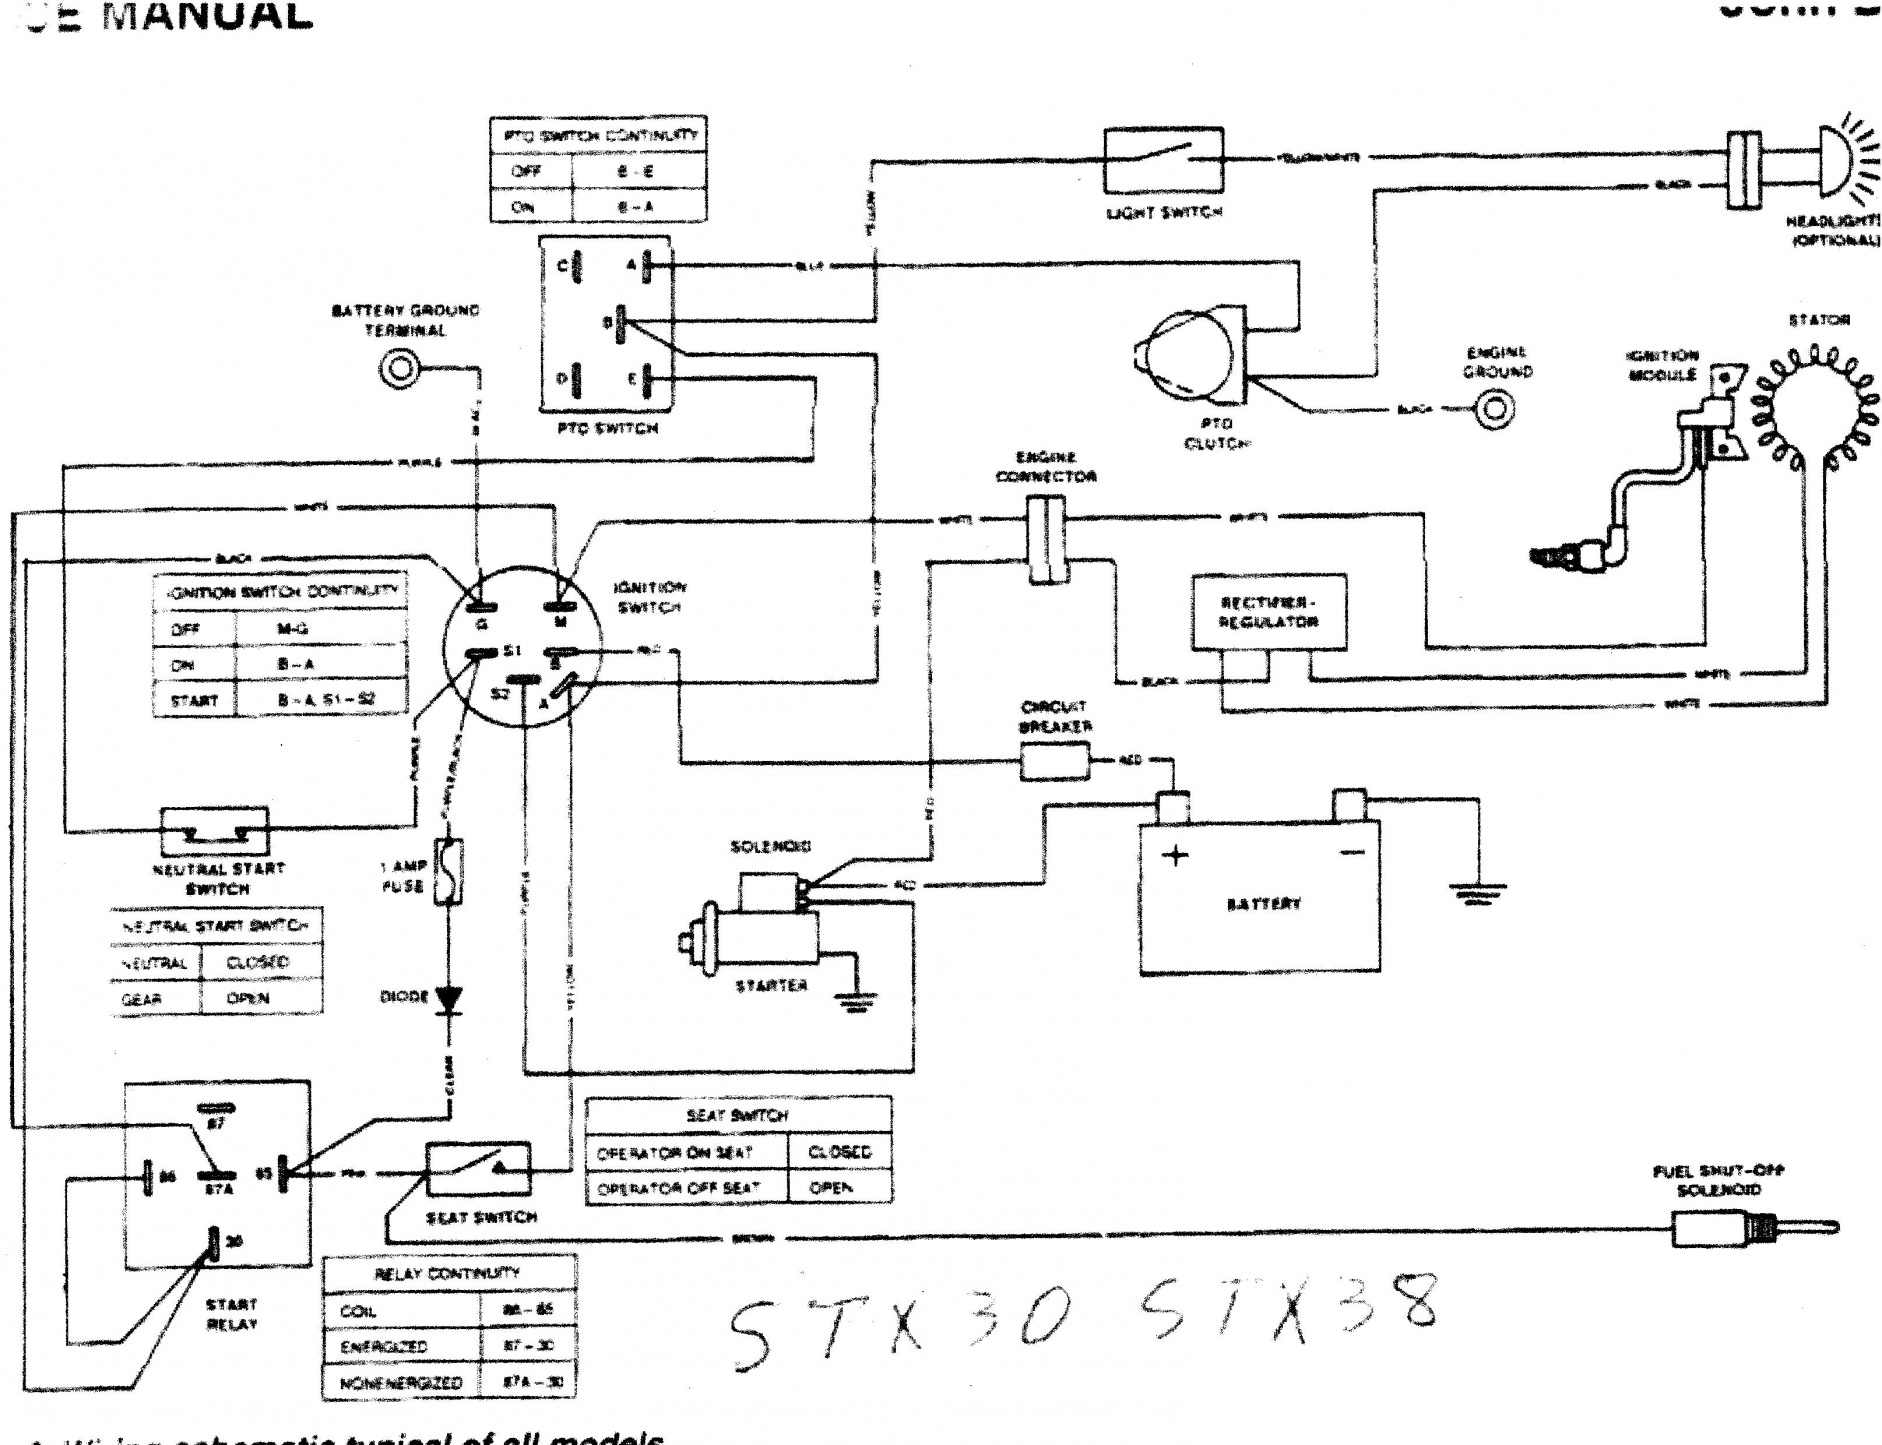 hight resolution of john deere 4430 wiring schematic wiring diagram john deere 318 wiring diagram